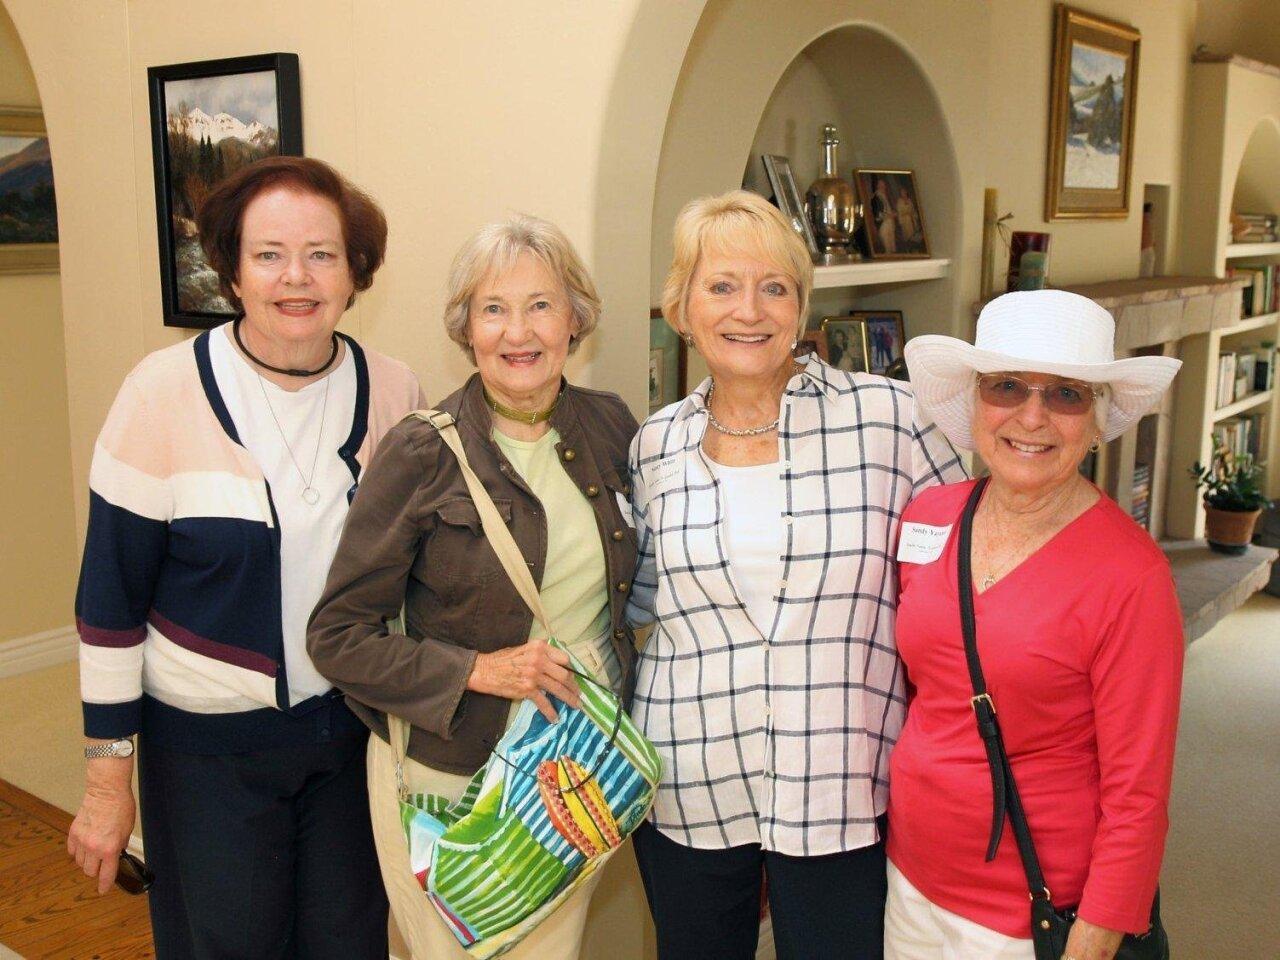 Pam Wasserman, Carol Streeter, Nancy White, Sandy Yayanos